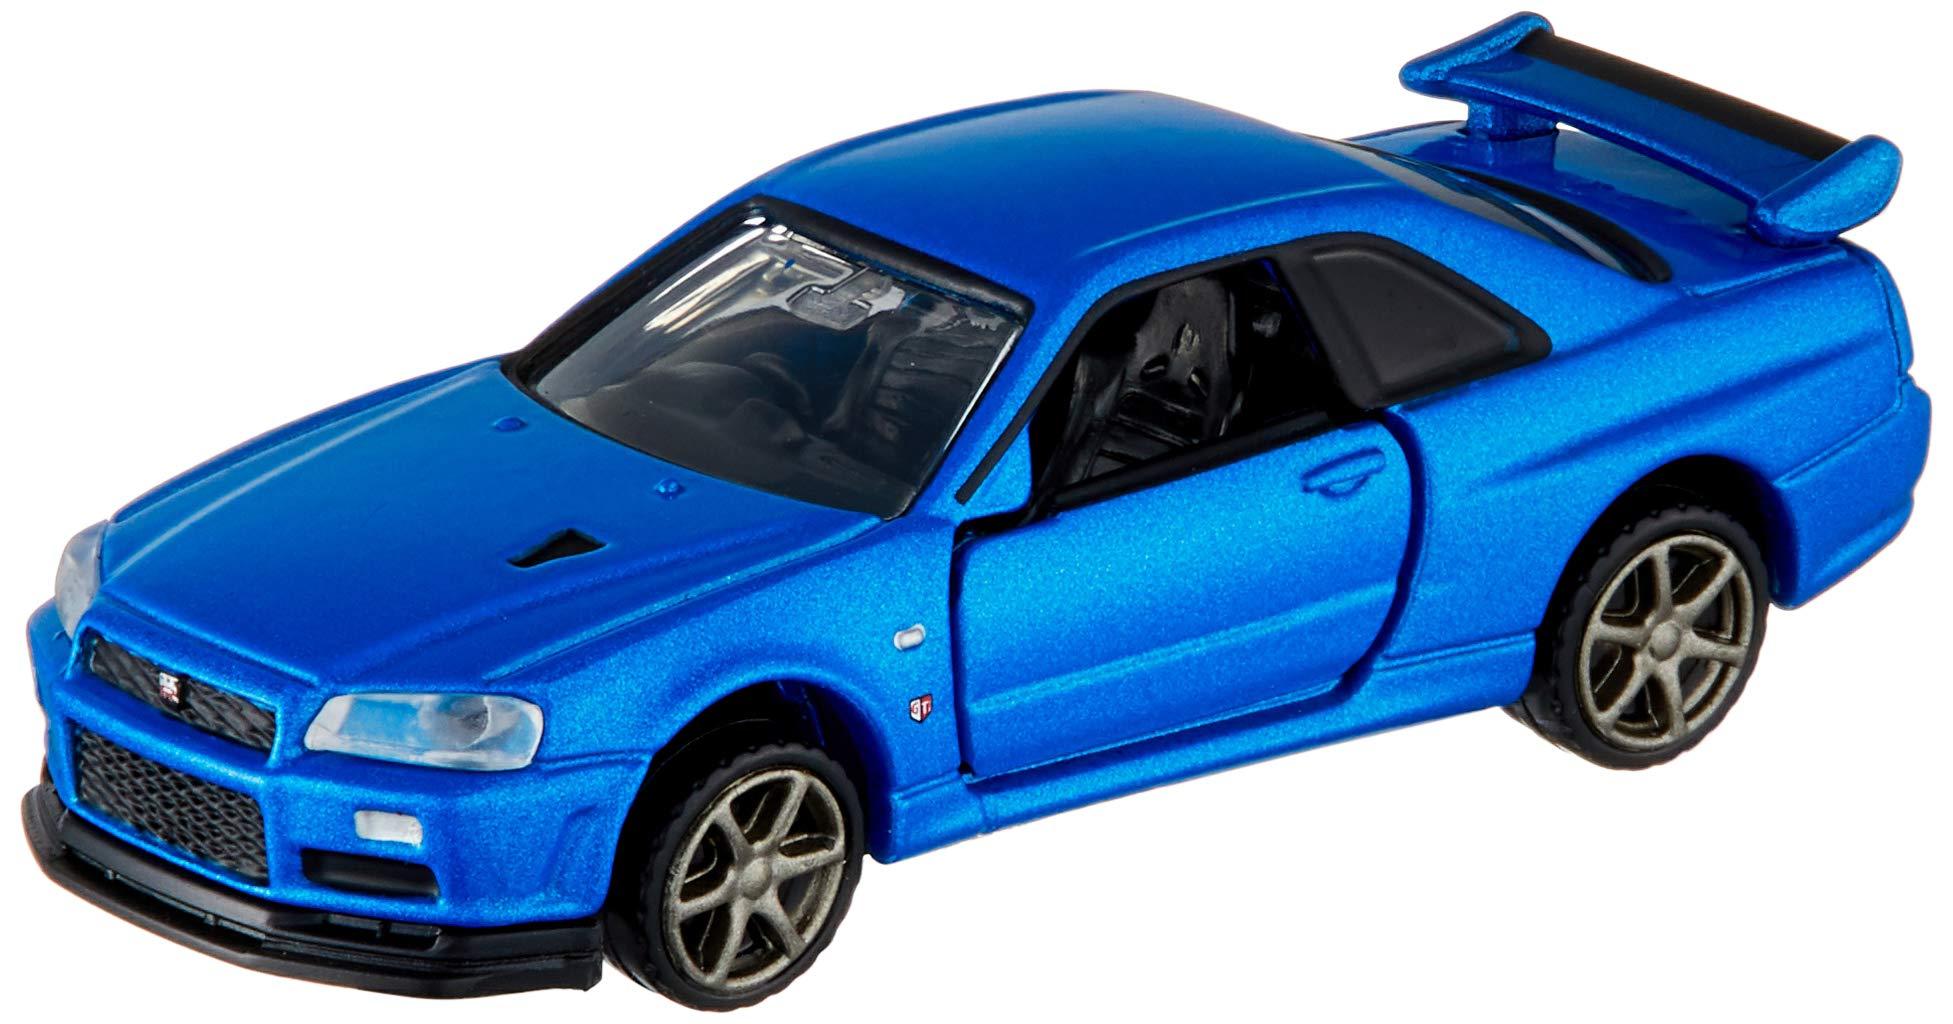 TAKARA TOMY Tomica Tomica Premium 11 Nissan Skyline GT-R V-SPECII Nur